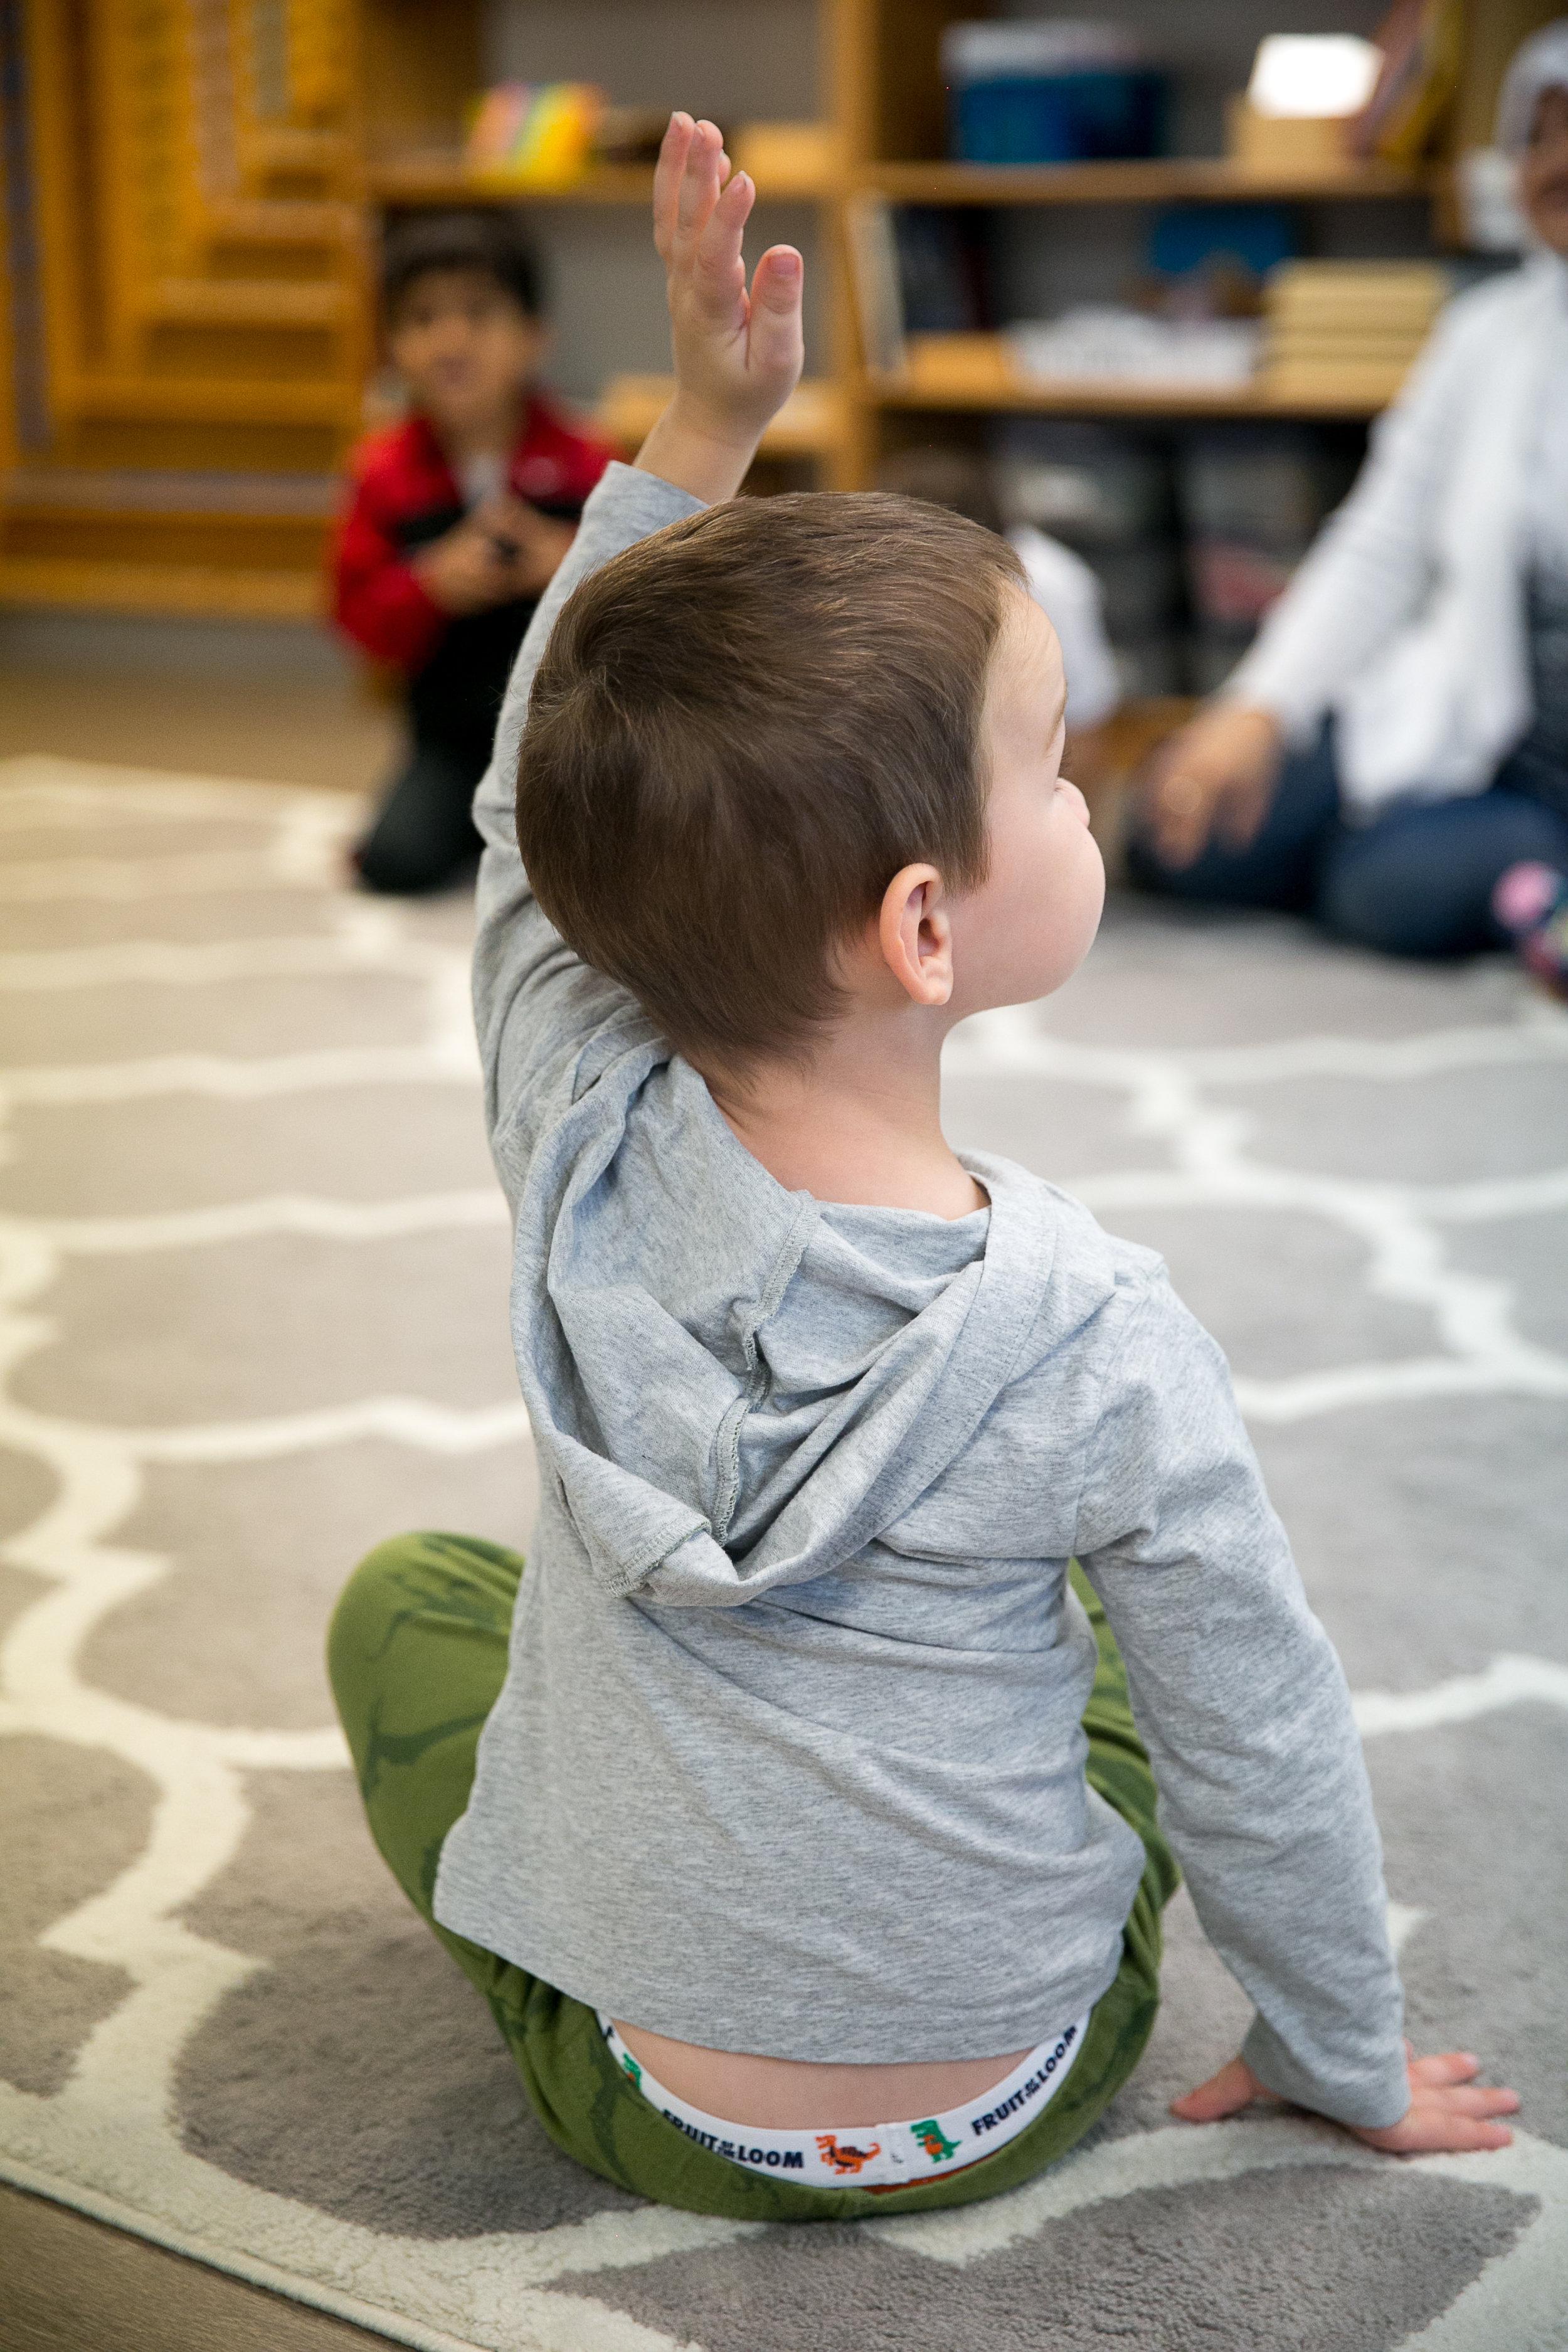 Rosehill_Montessori_Preschool_Kindergarten_classroom_practical_life_learning_curriculum.jpg